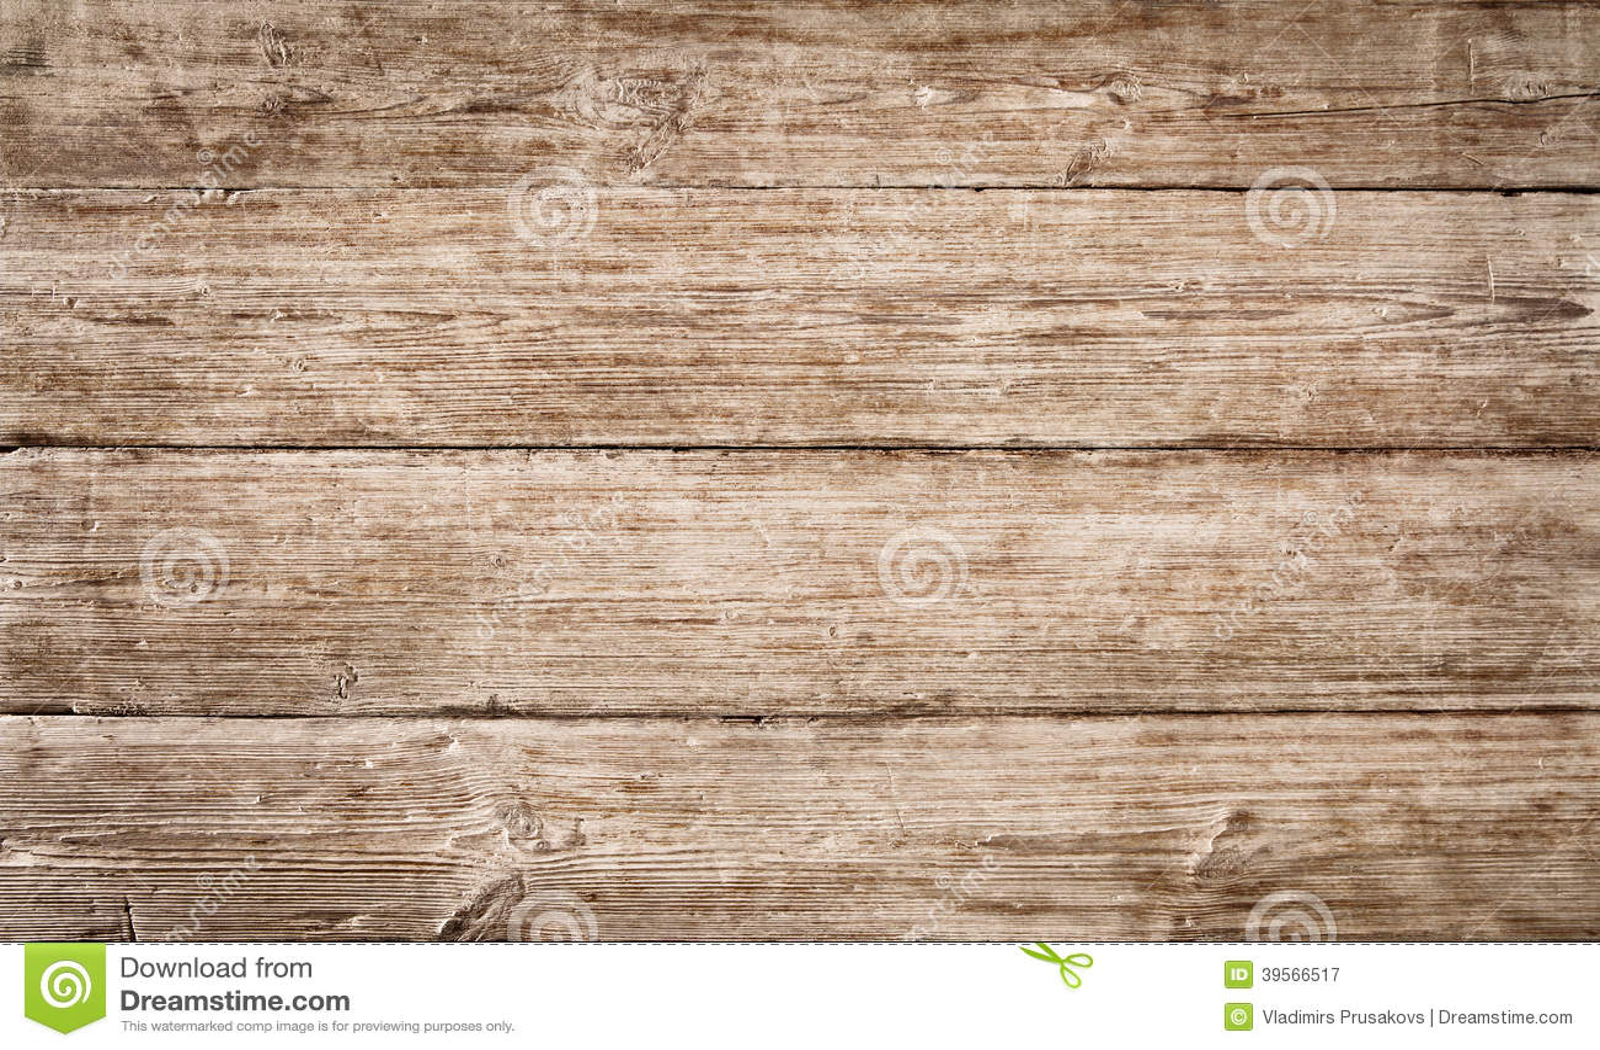 Old wooden boards as background - Background Board Fiber Grain Light Old